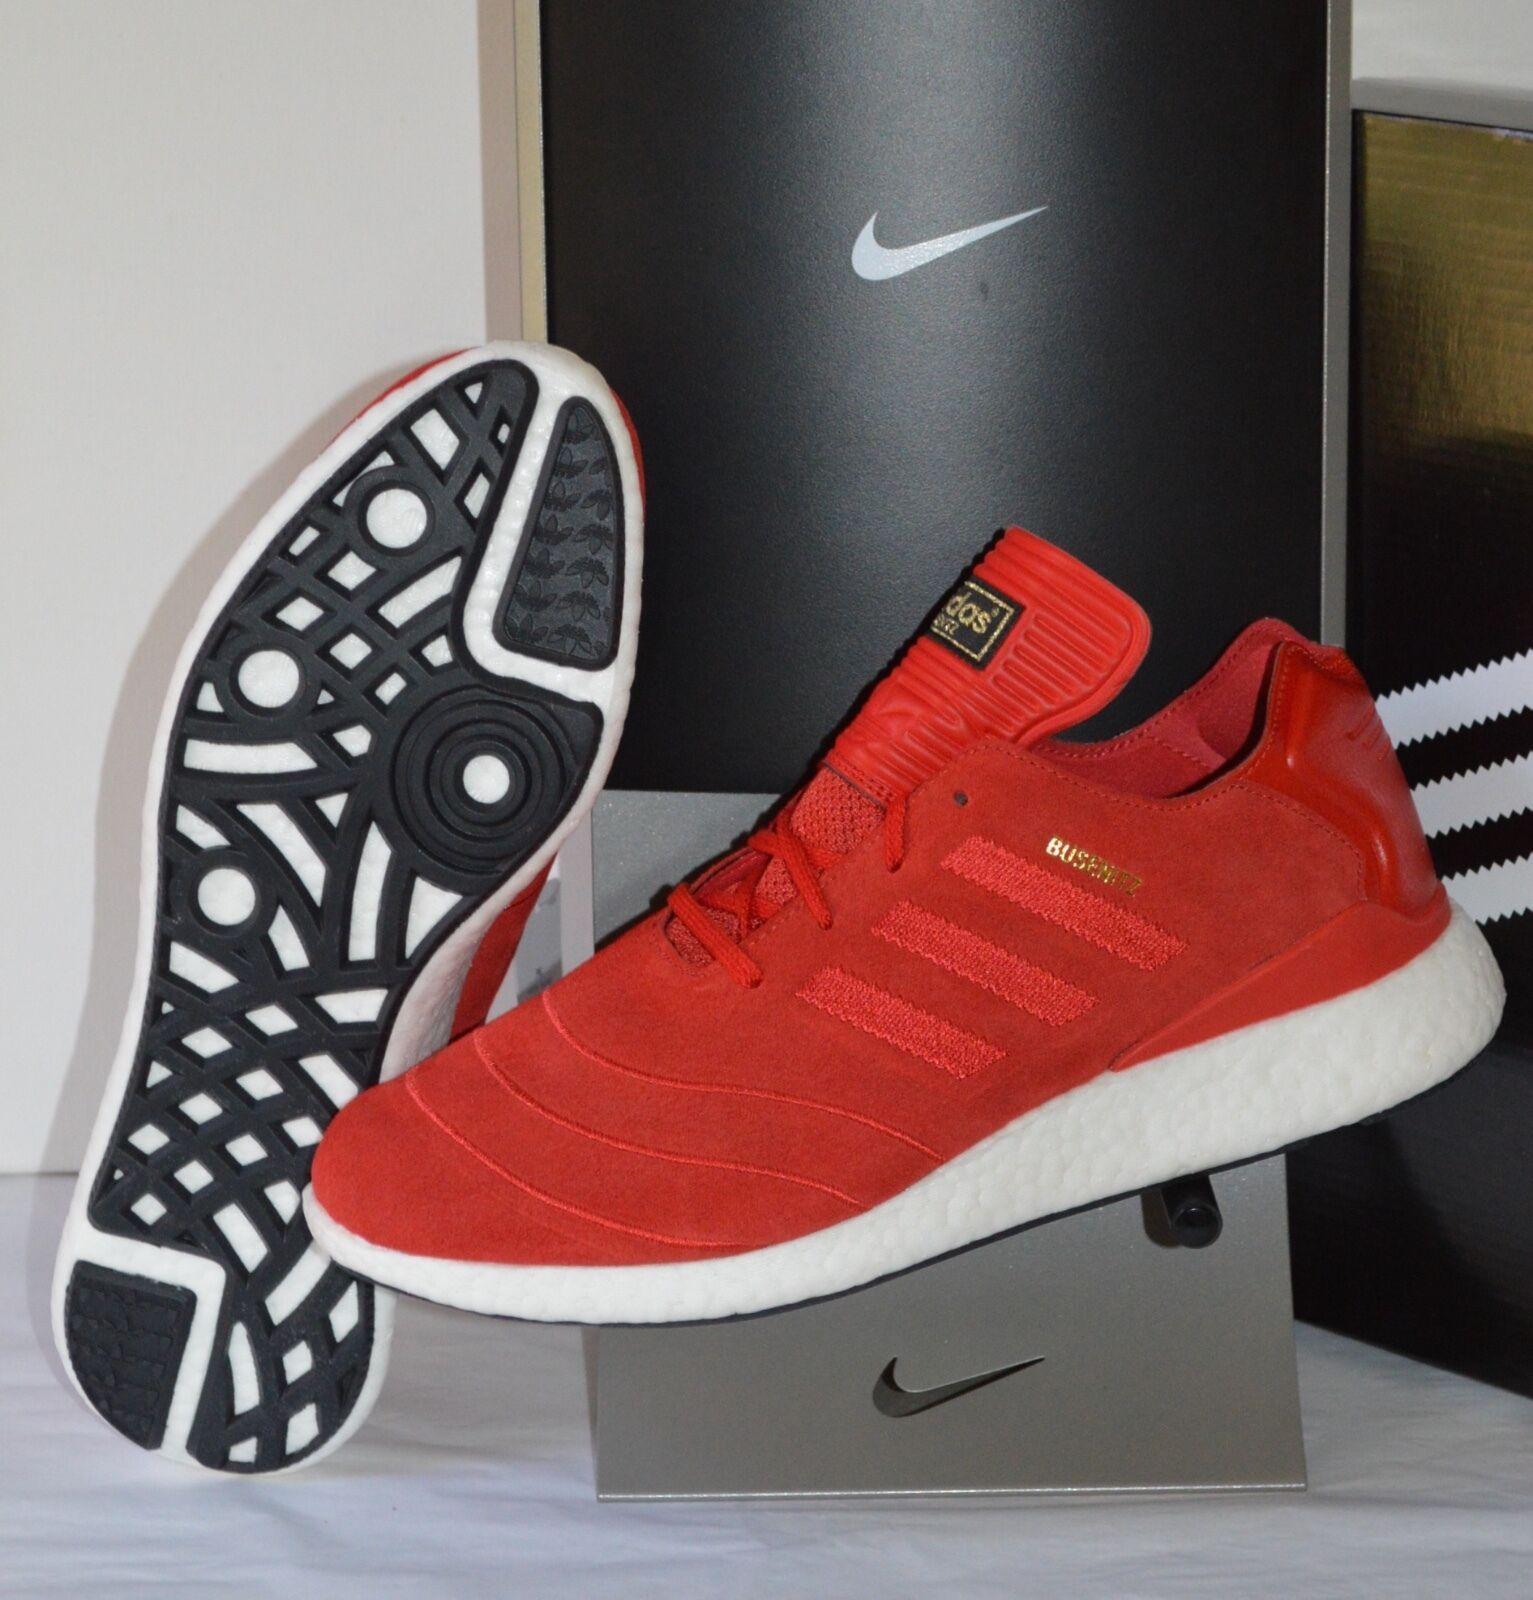 New 140 Adidas Busenitz Pure Boost Ultra Scarlet Red/White Skateboarding sz 11